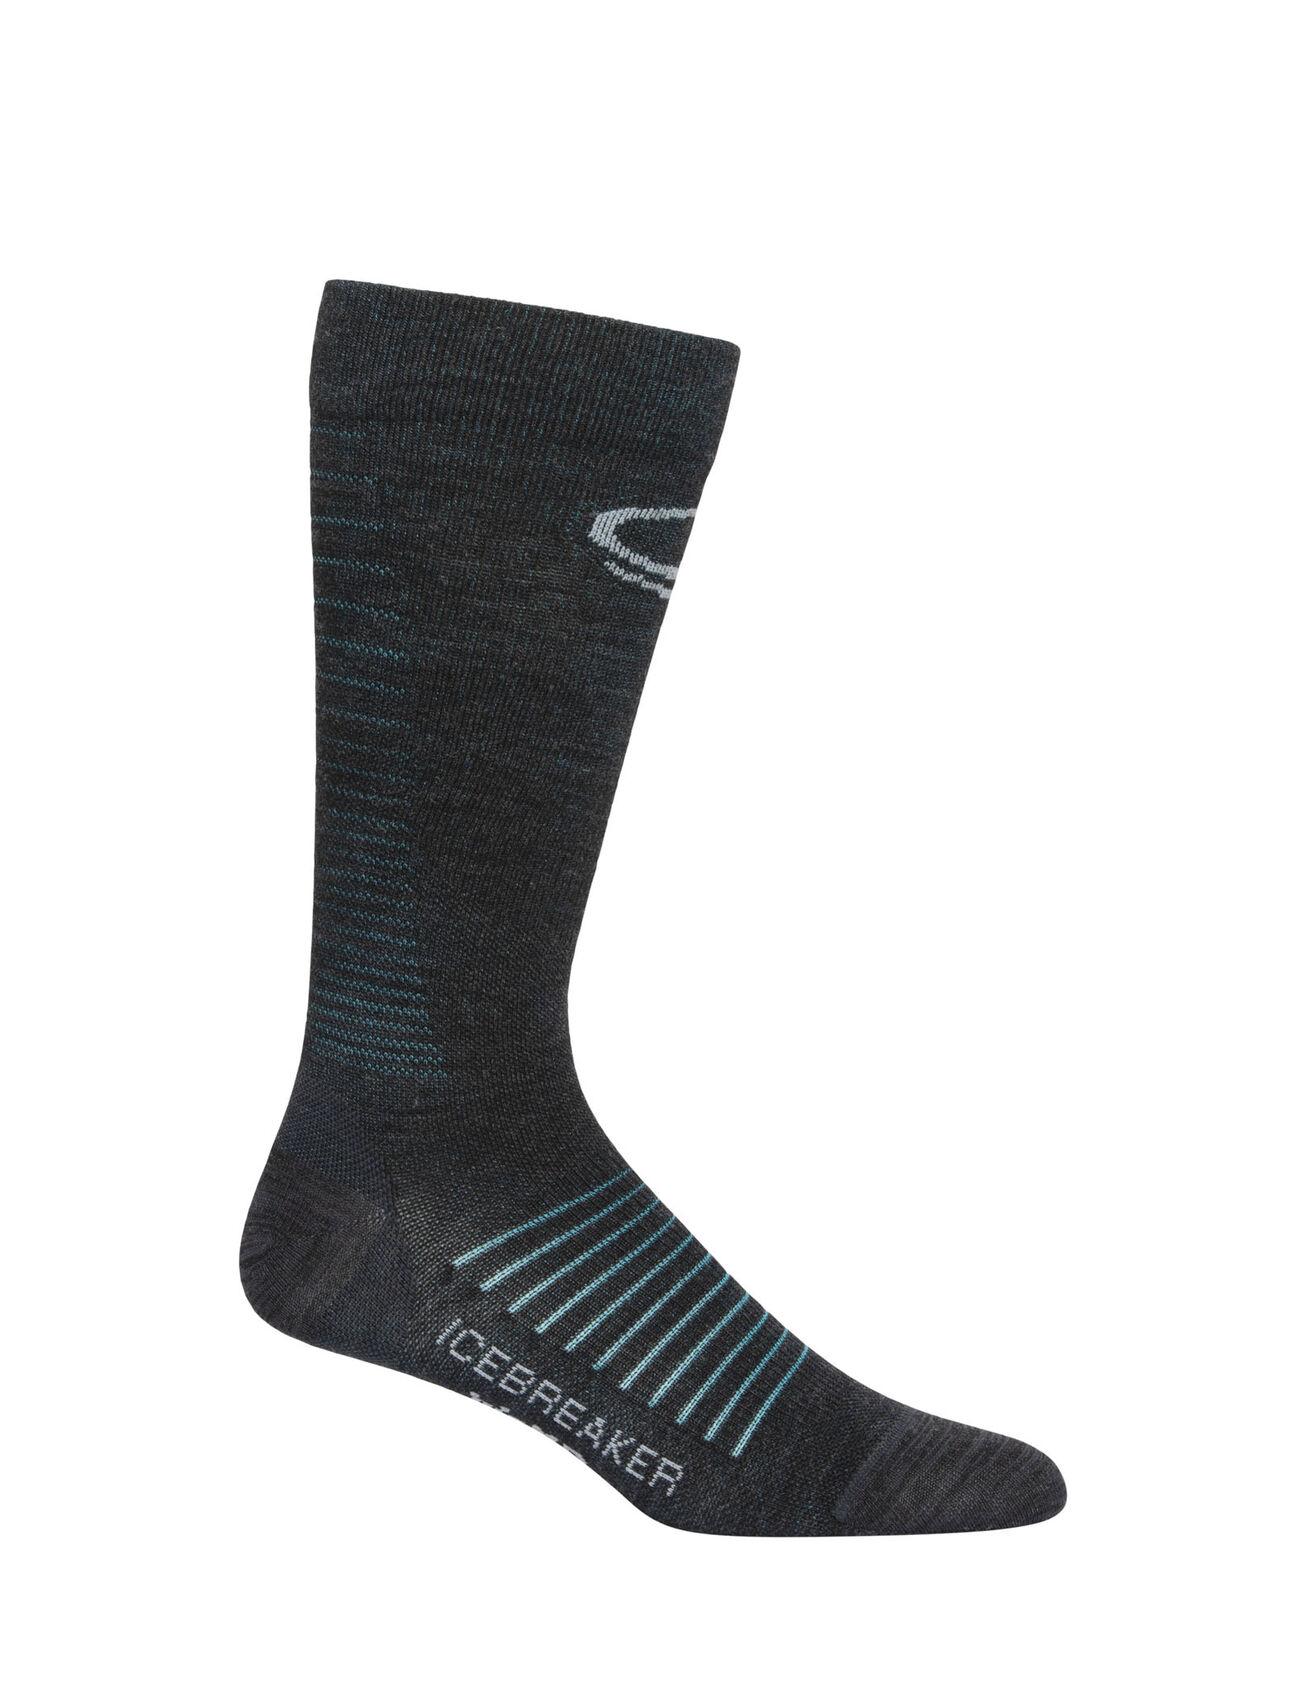 Merino Ski+ Compression Ultralight Over the Calf Socks